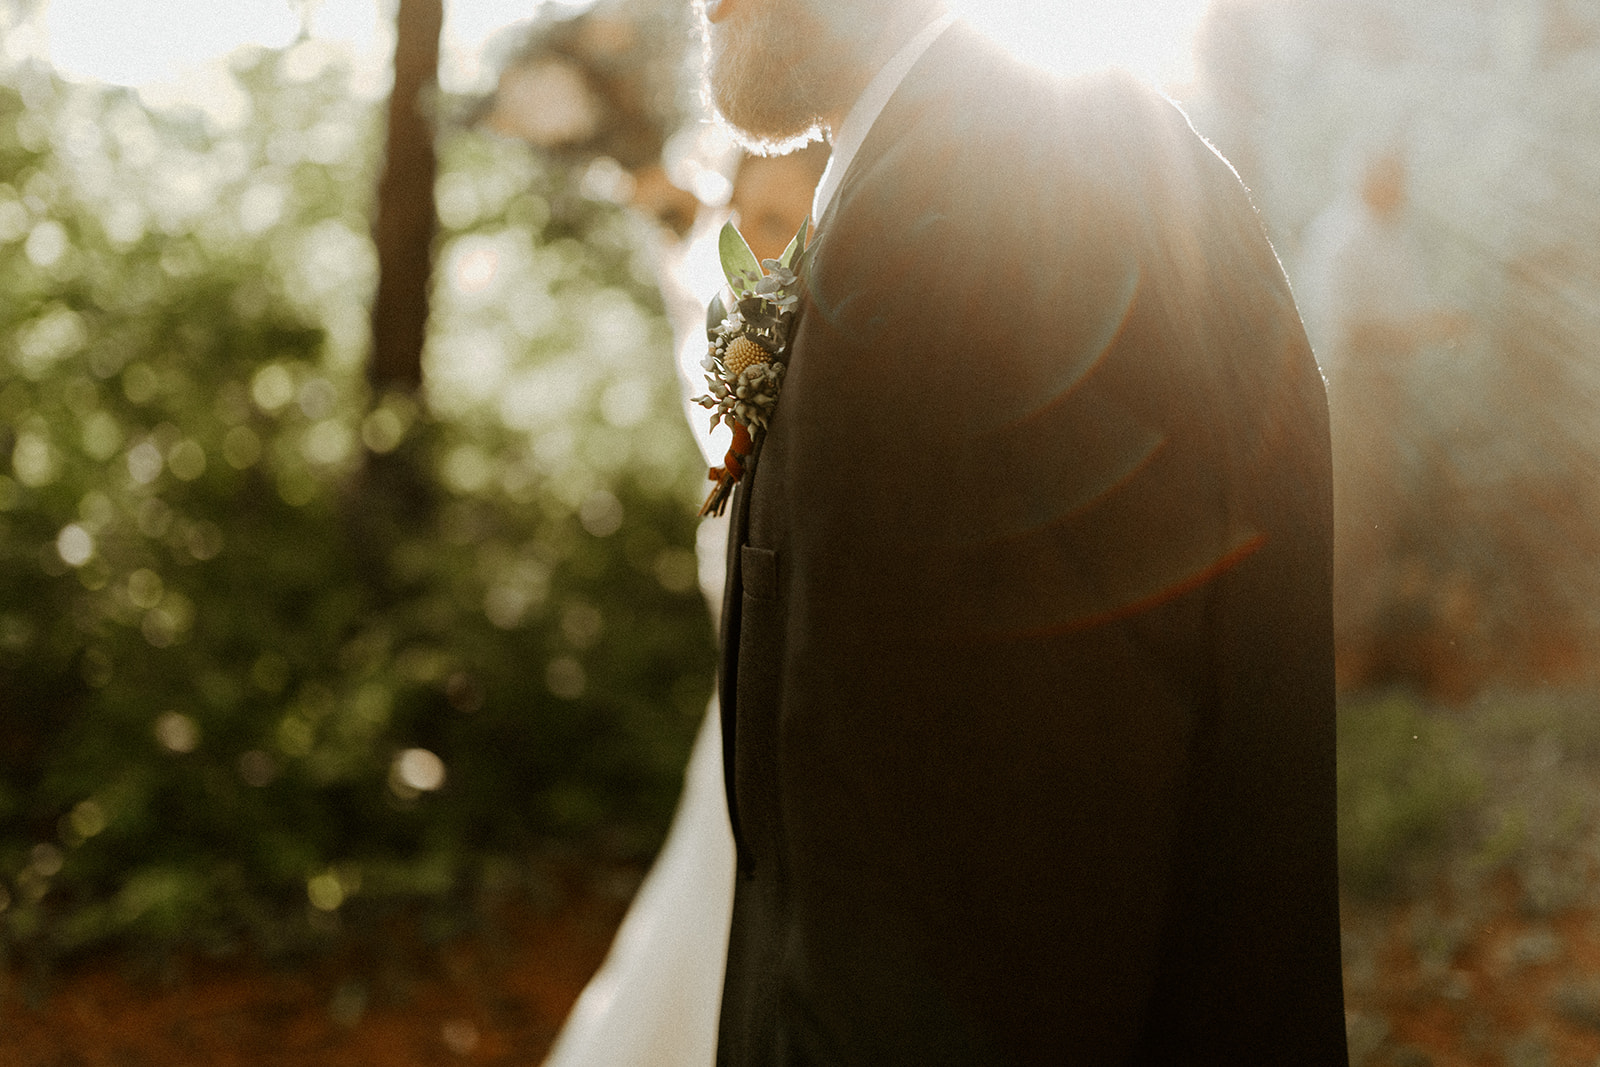 camp_wokanda_peoria_illinois_wedding_photographer_wright_photographs_bliese_0290.jpg